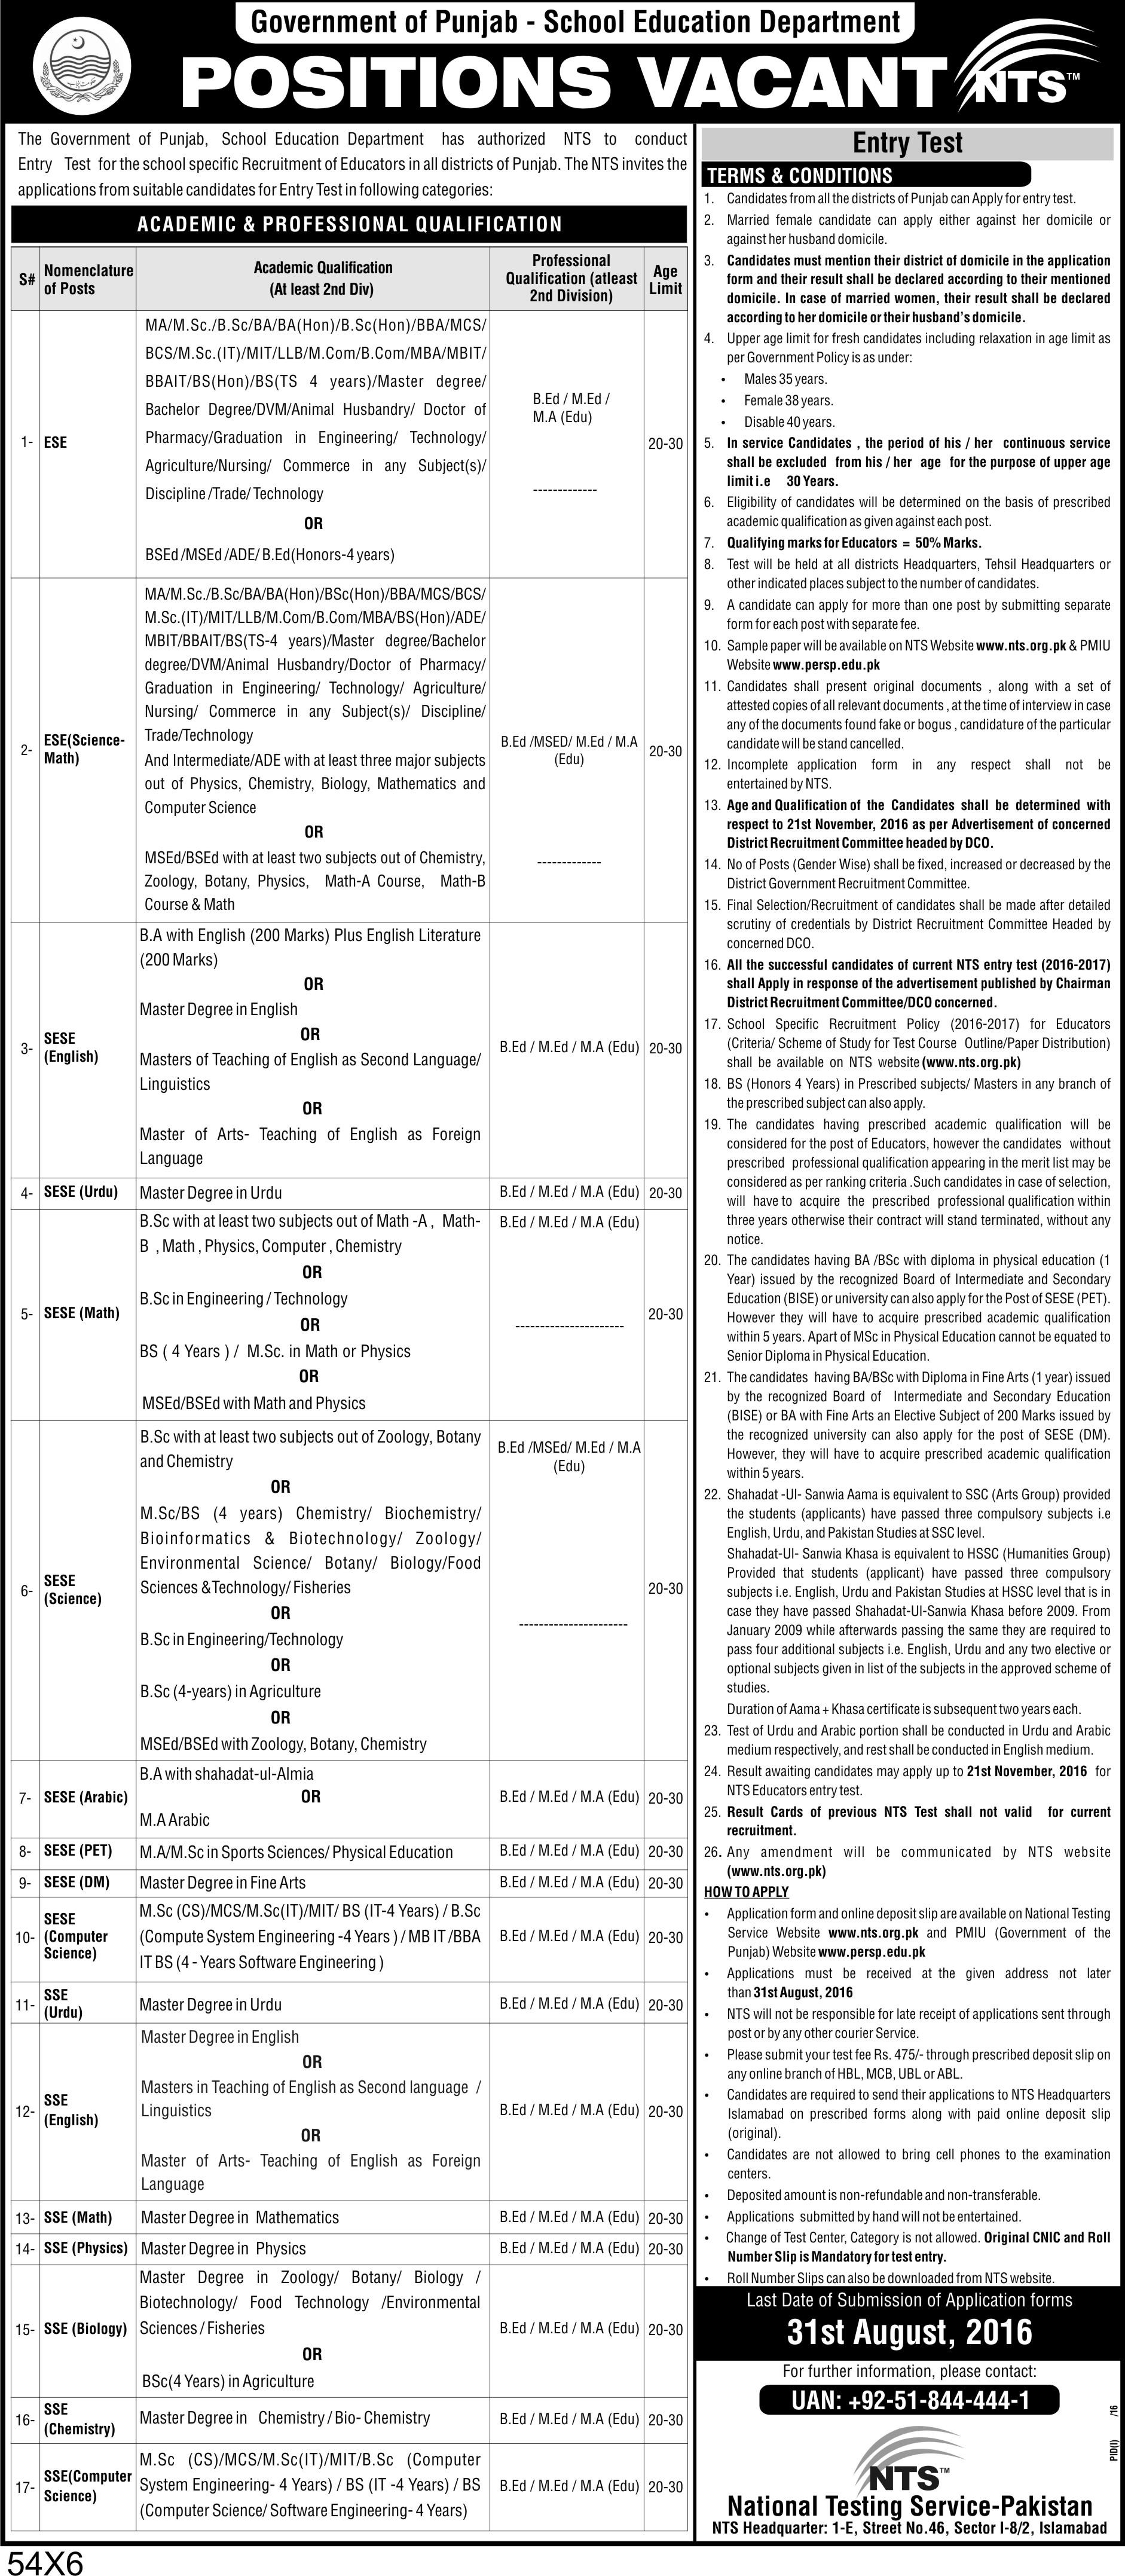 Application Form For Educators Jobs In Punjab 2016 Art, Science Online